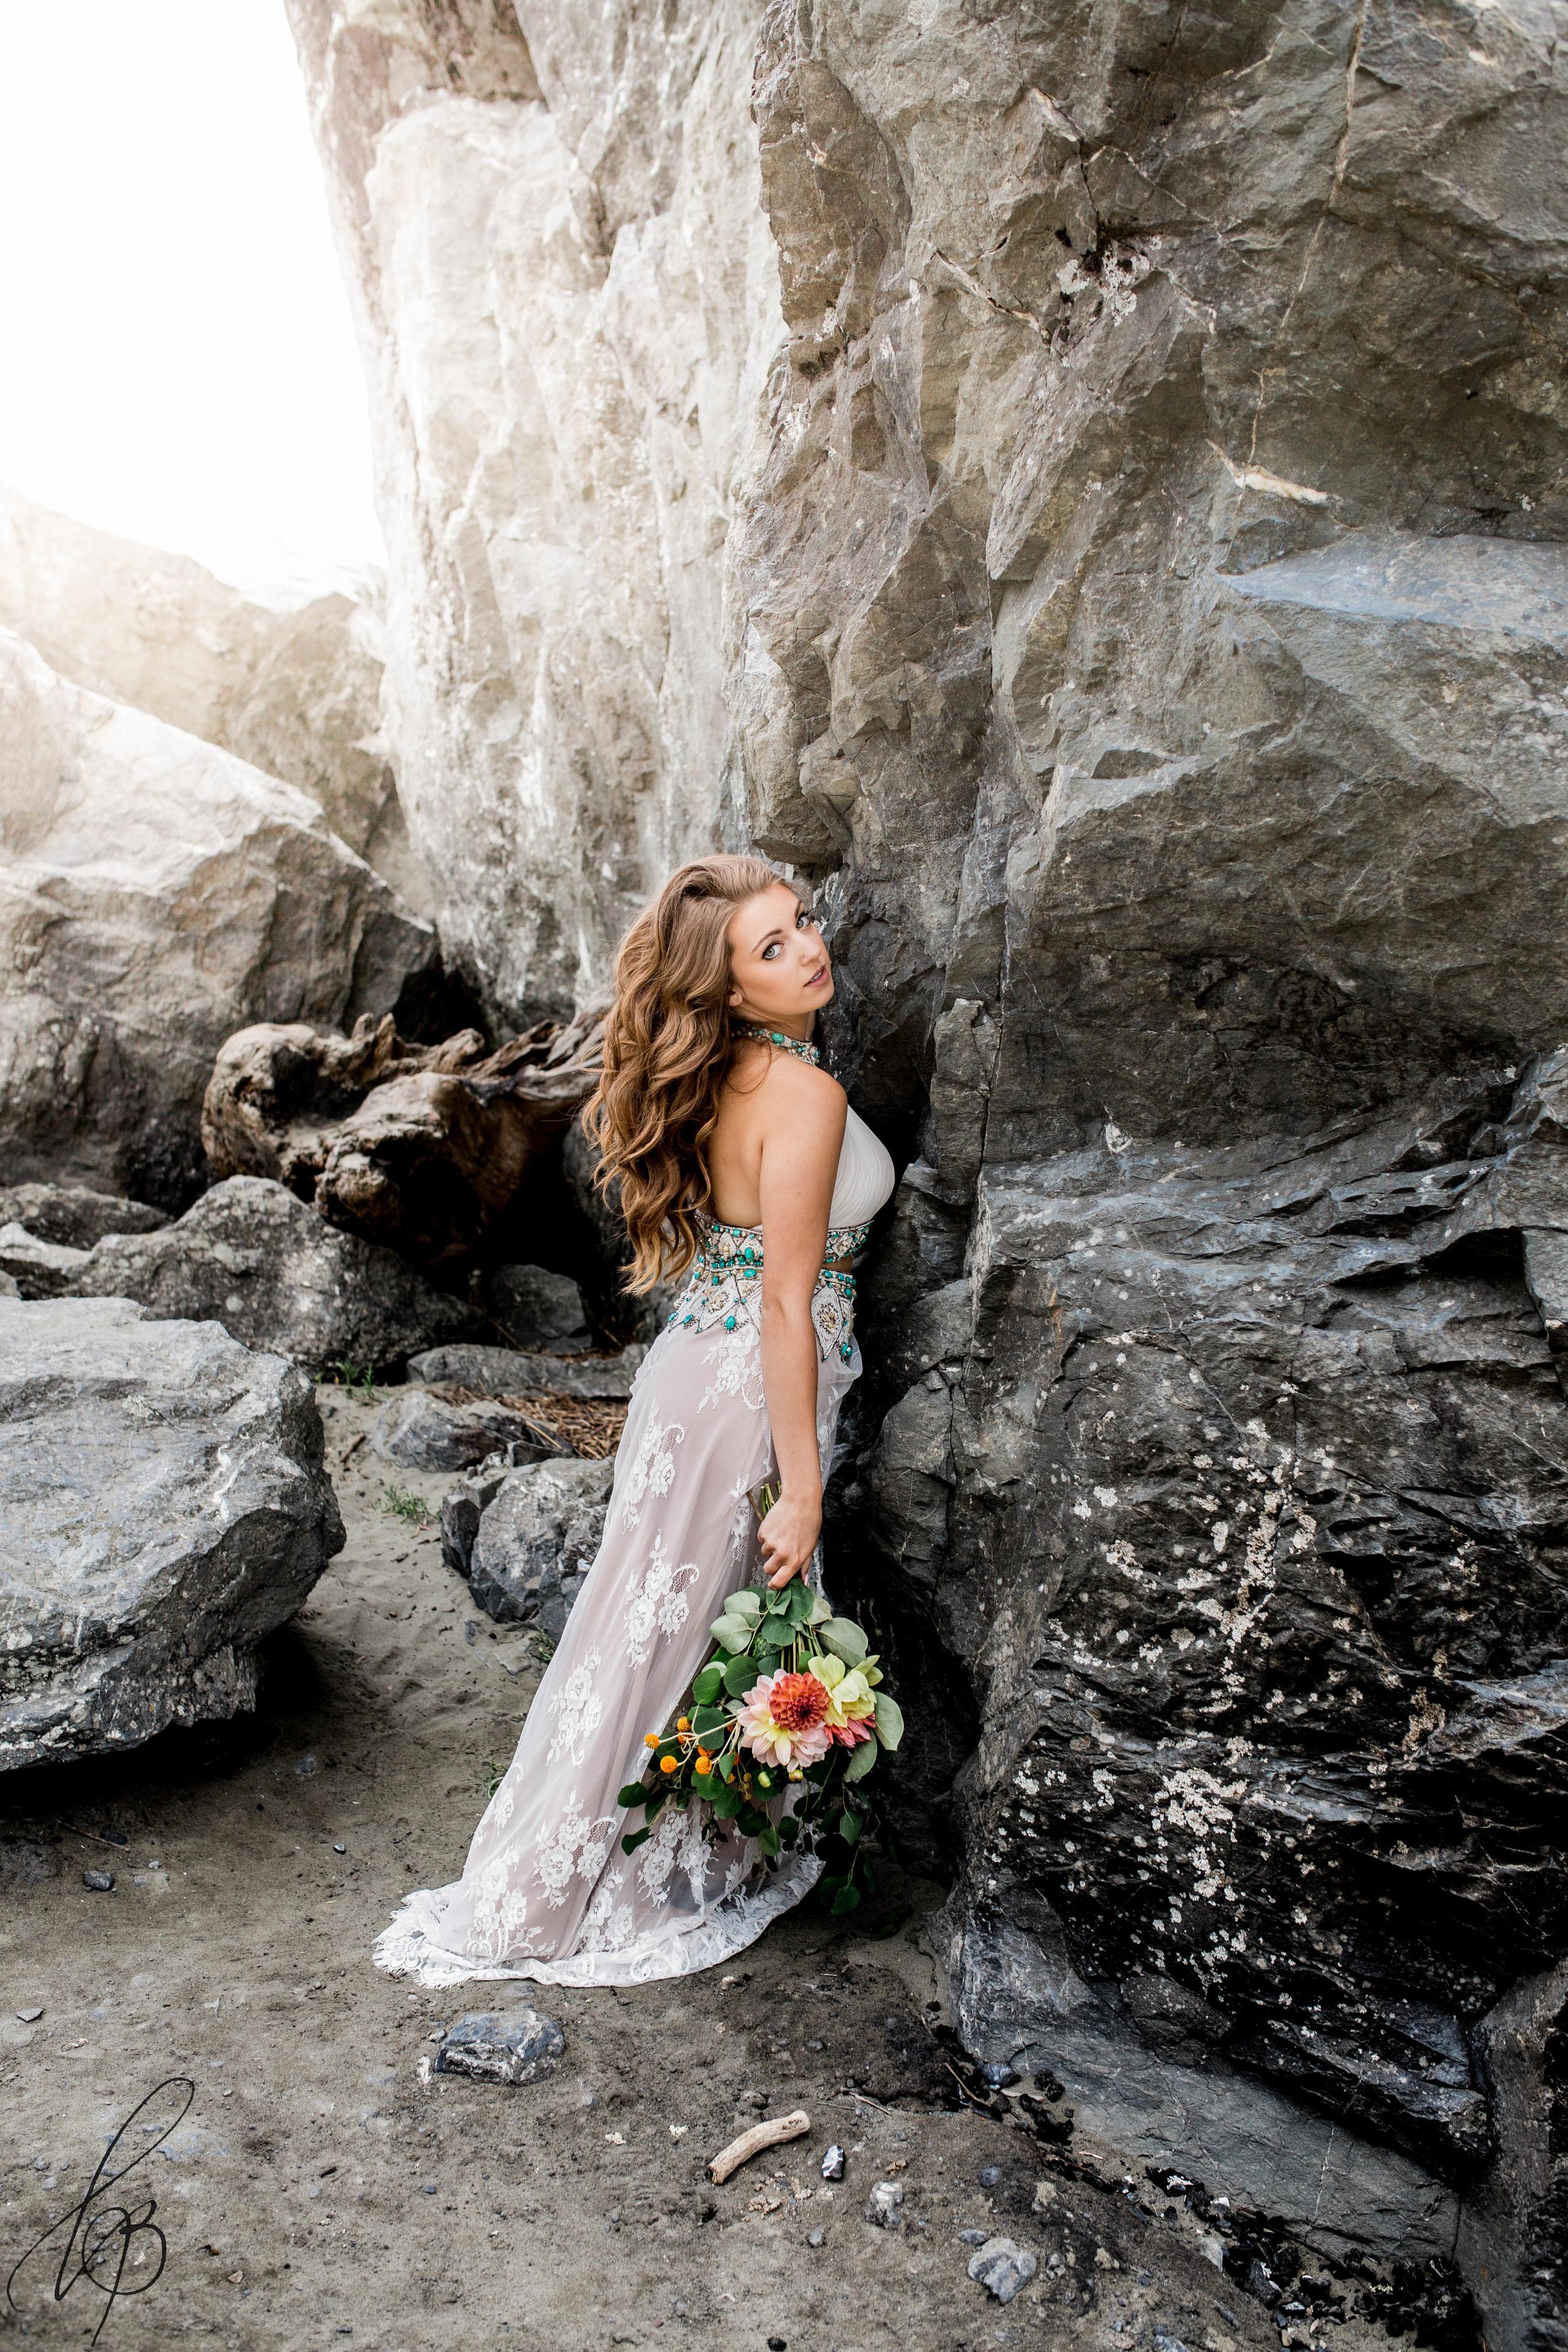 Lubbock-texas-wedding-fashion-lifestyle-fine-art-photographer-west-texas-photography-31.jpg